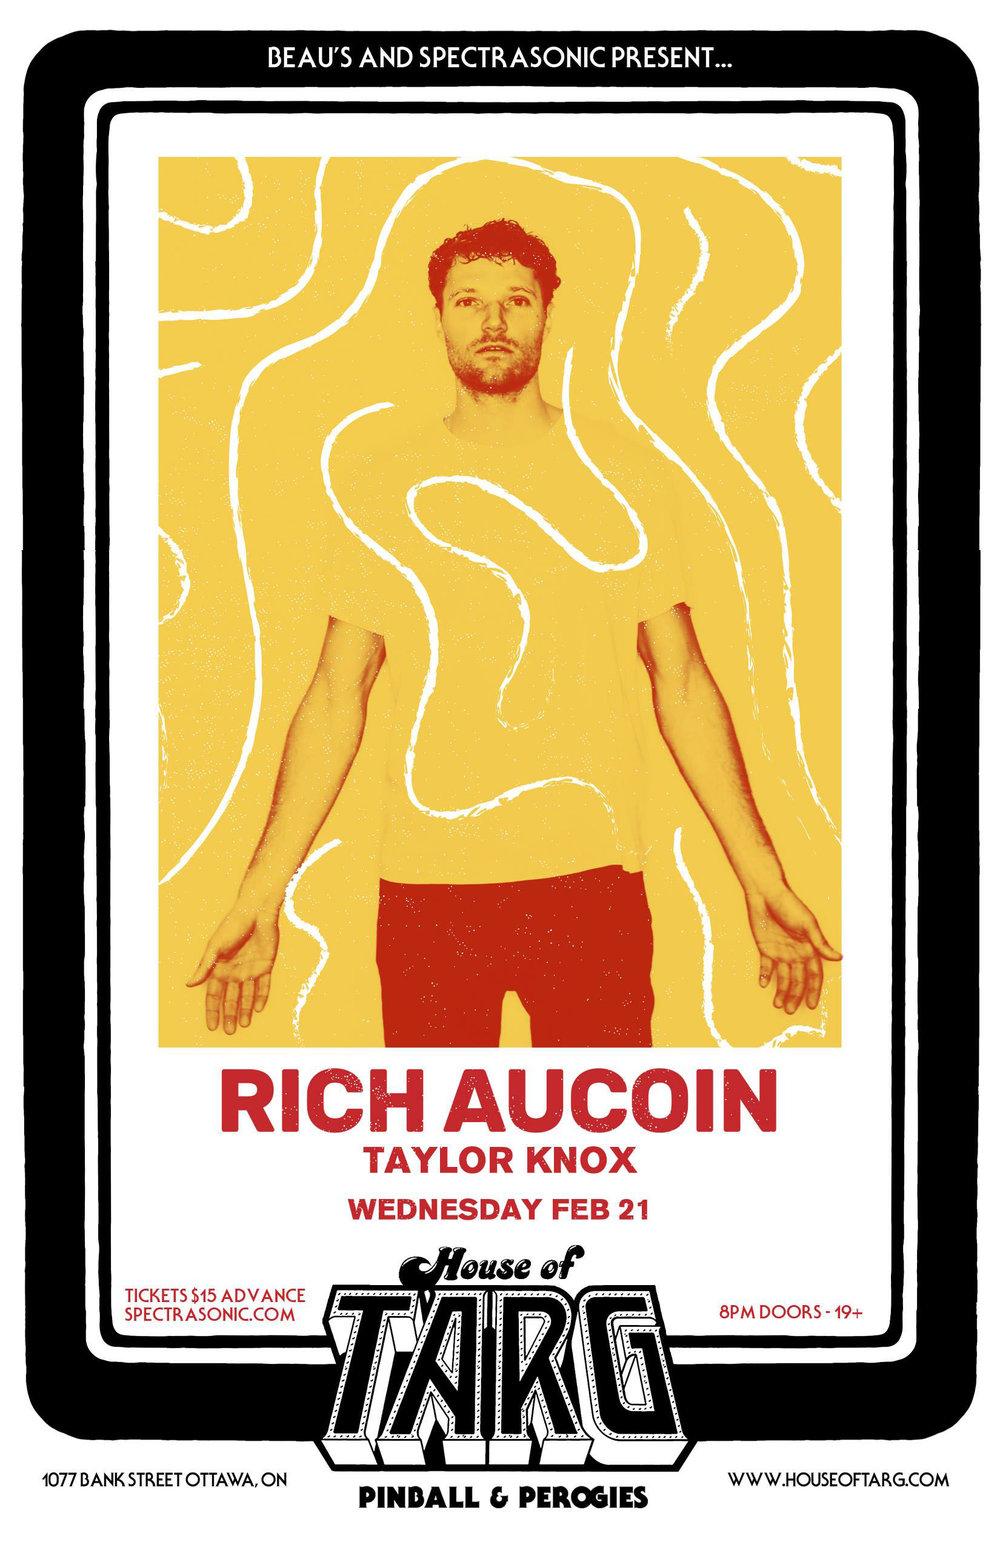 RIch Aucoin v2.jpg